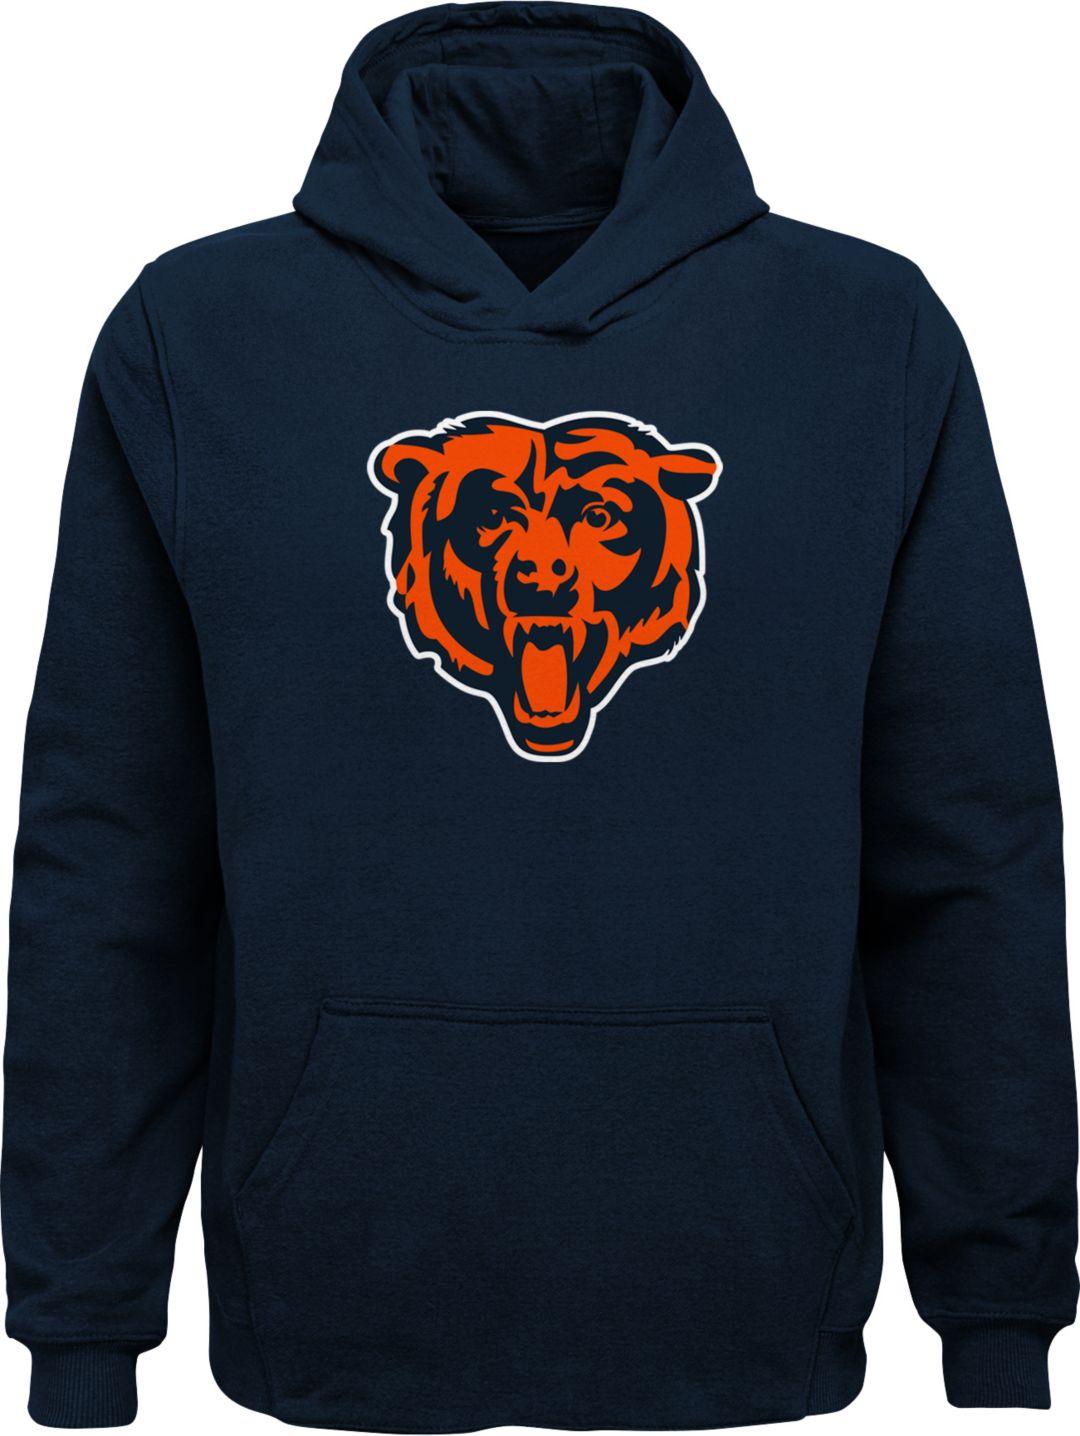 Top NFL Team Apparel Youth Chicago Bears Logo Navy Hoodie | DICK'S